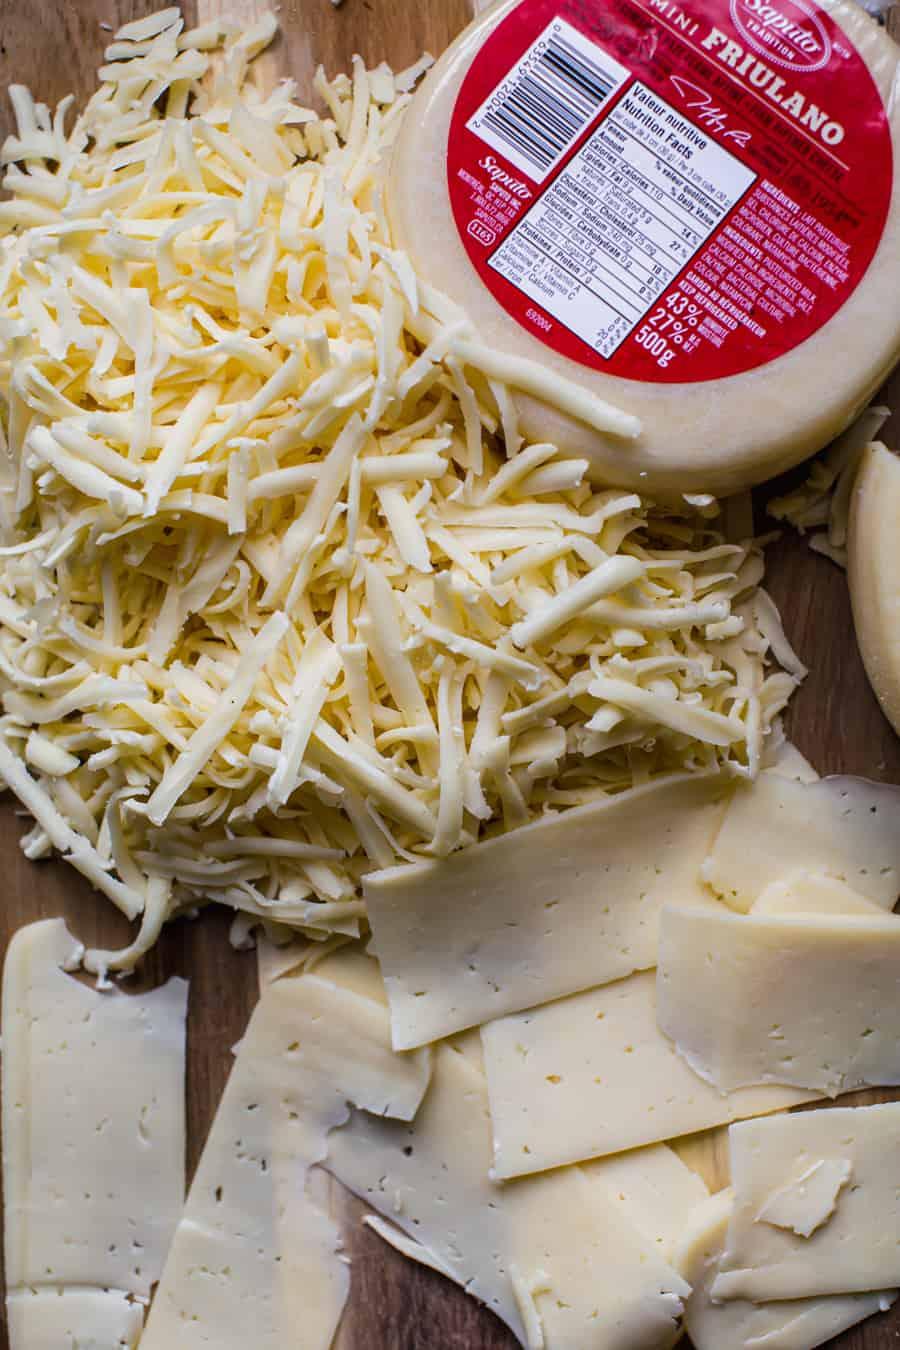 friulano cheese